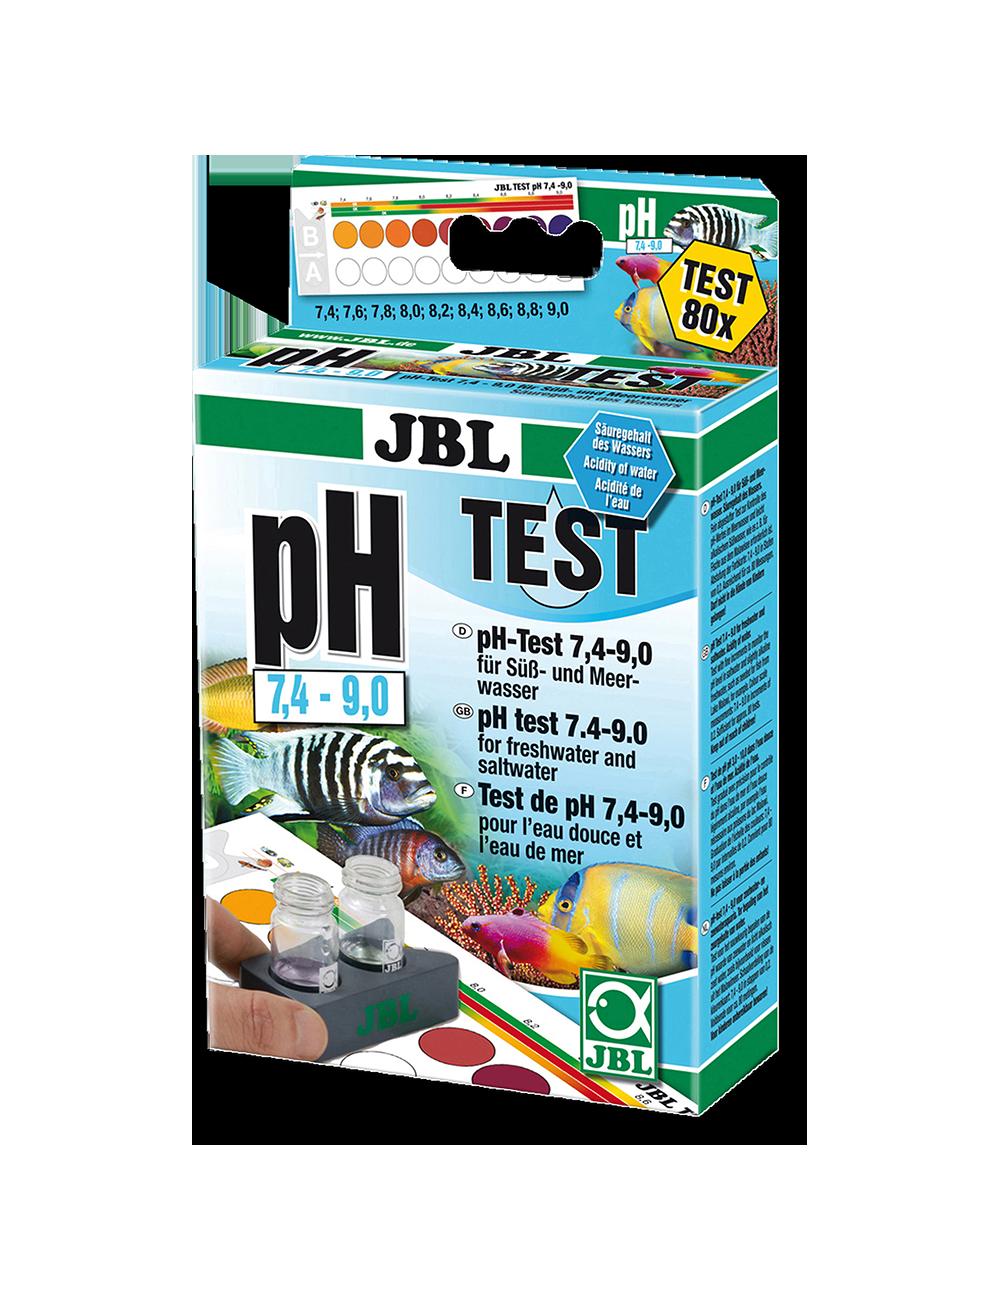 JBL - Test pH 7,4-9,0 - 80 mesures